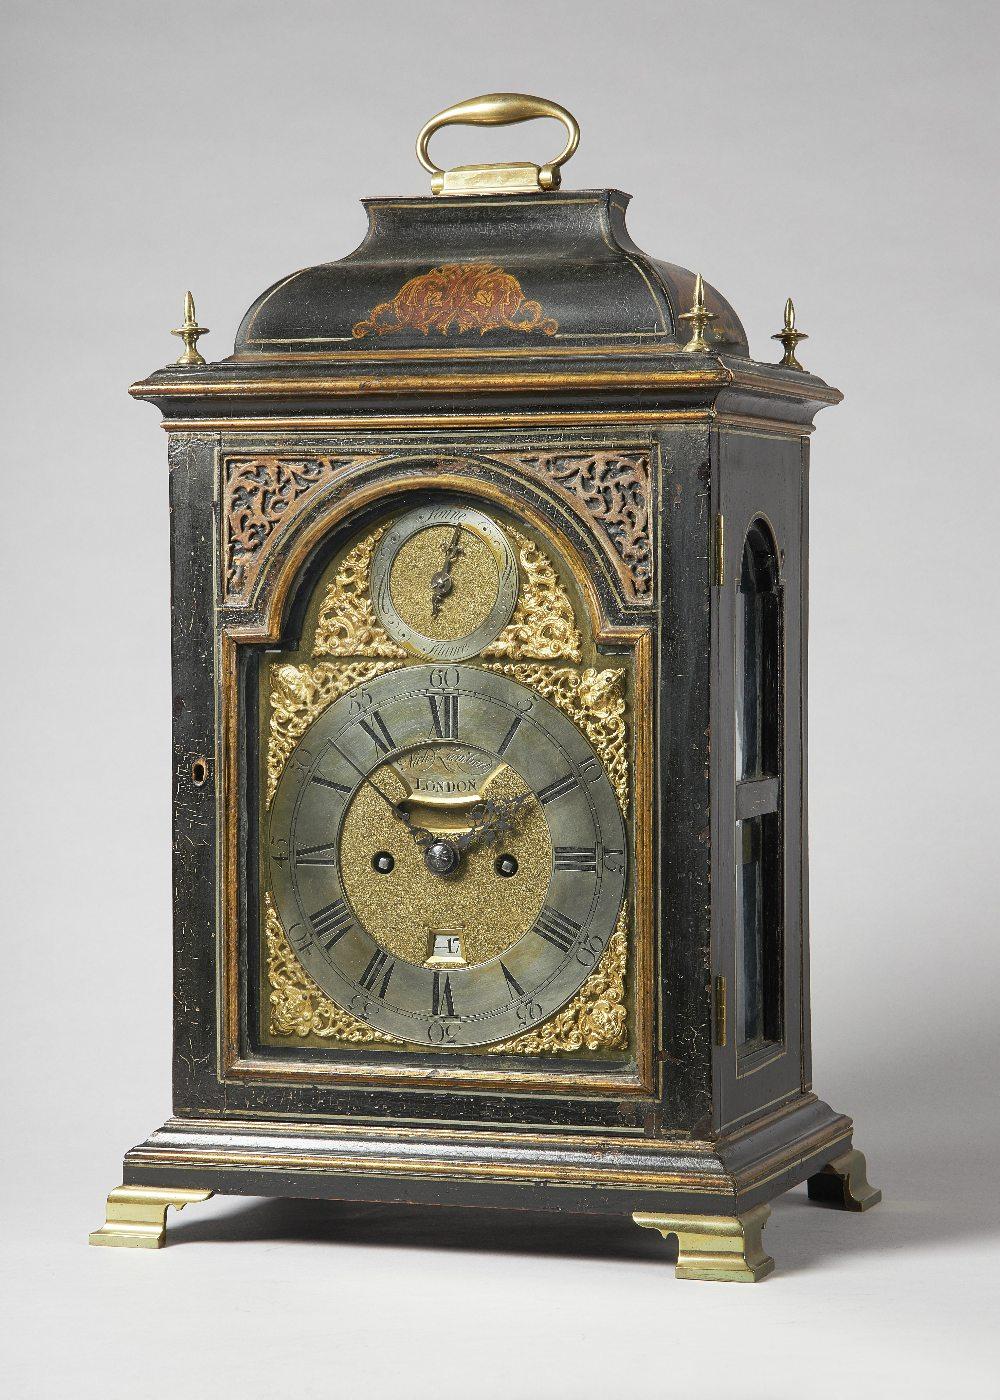 Lot 676 - A late George III parcel-gilt,